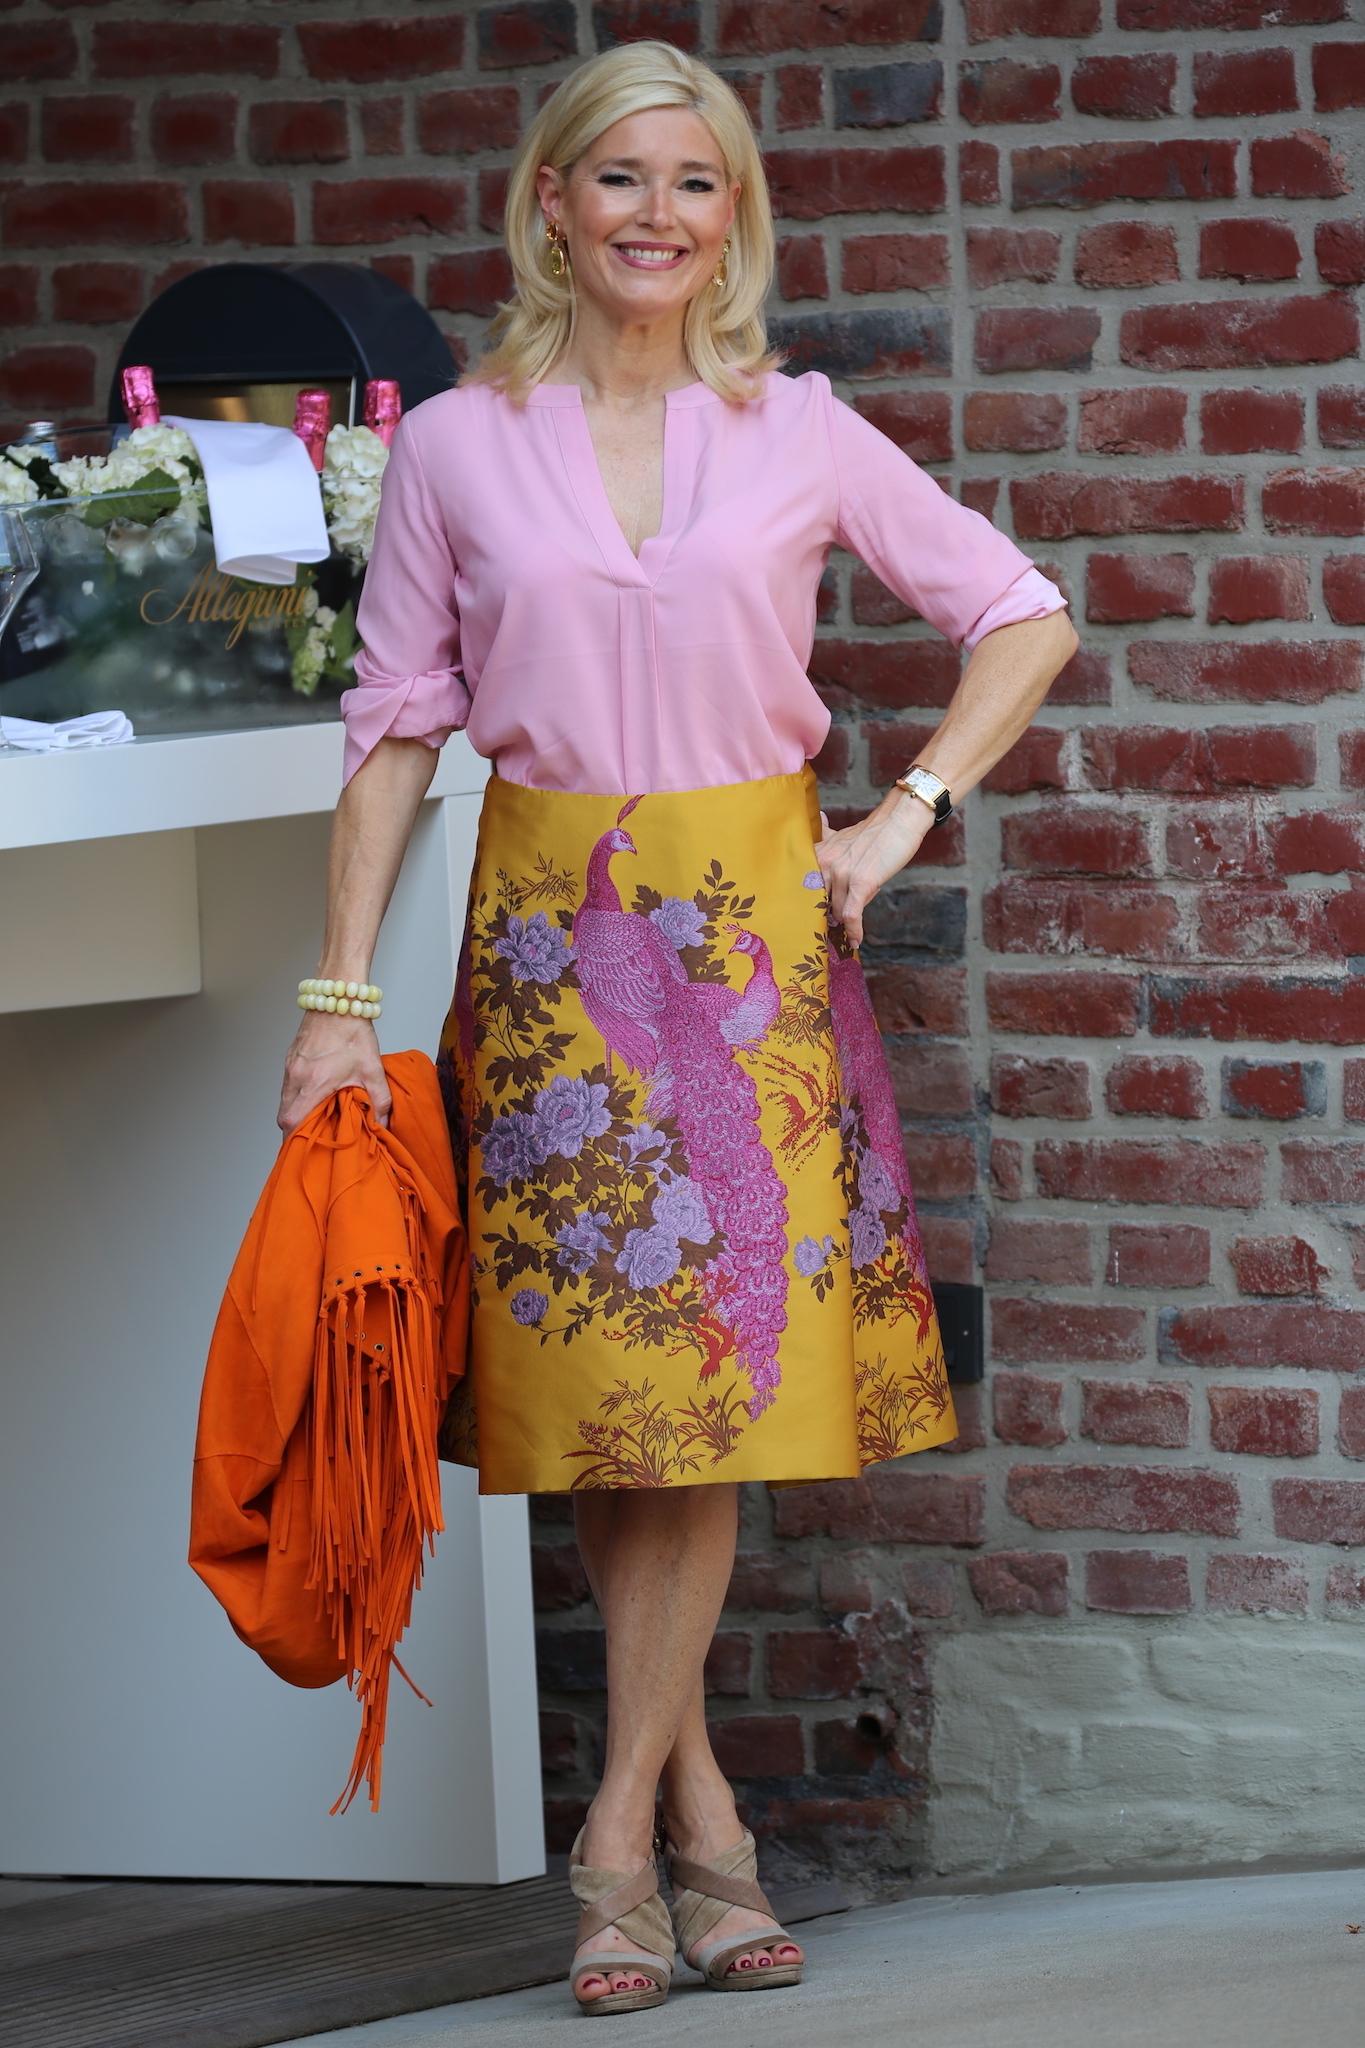 Petra Dieners, I & I Beautiful Dresses, Zingaro Ledercape, Herzstück Seidenbluse, Fashion-Blog, Lieblingsstil.com,